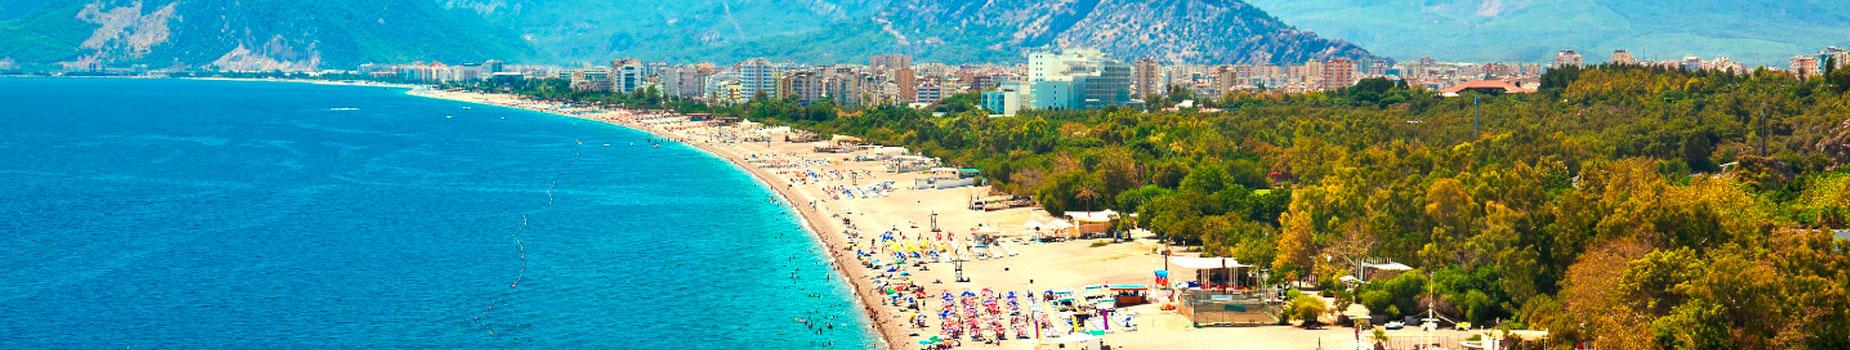 Kindvriendelijke hotels Antalya